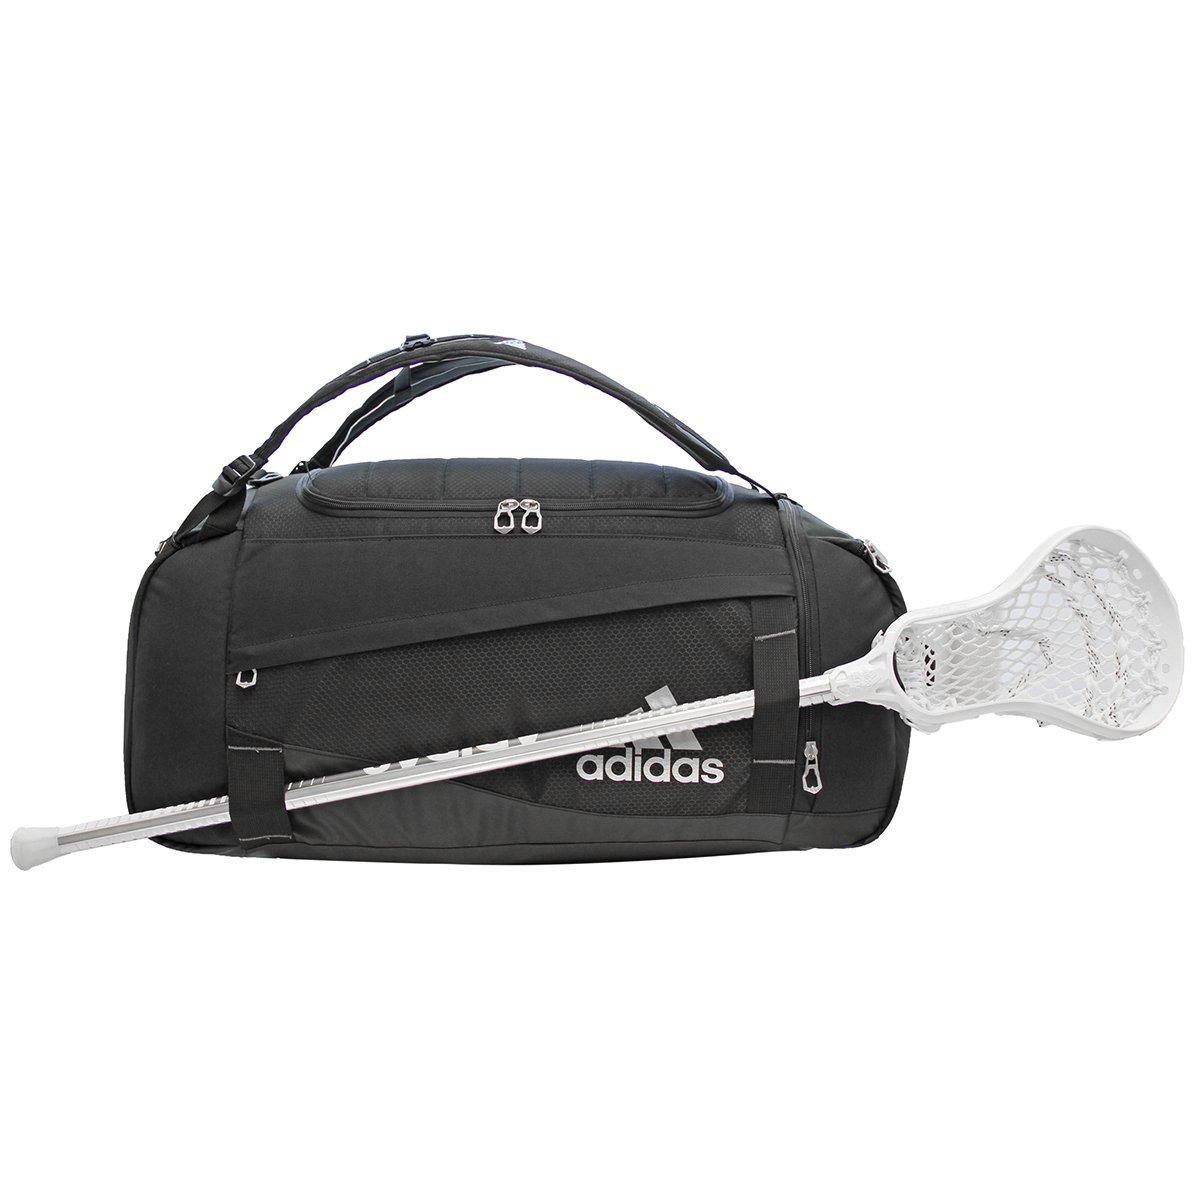 Utilidad: adidas unisex unisex unisex mochila de lona lacrosse, negro f867e0